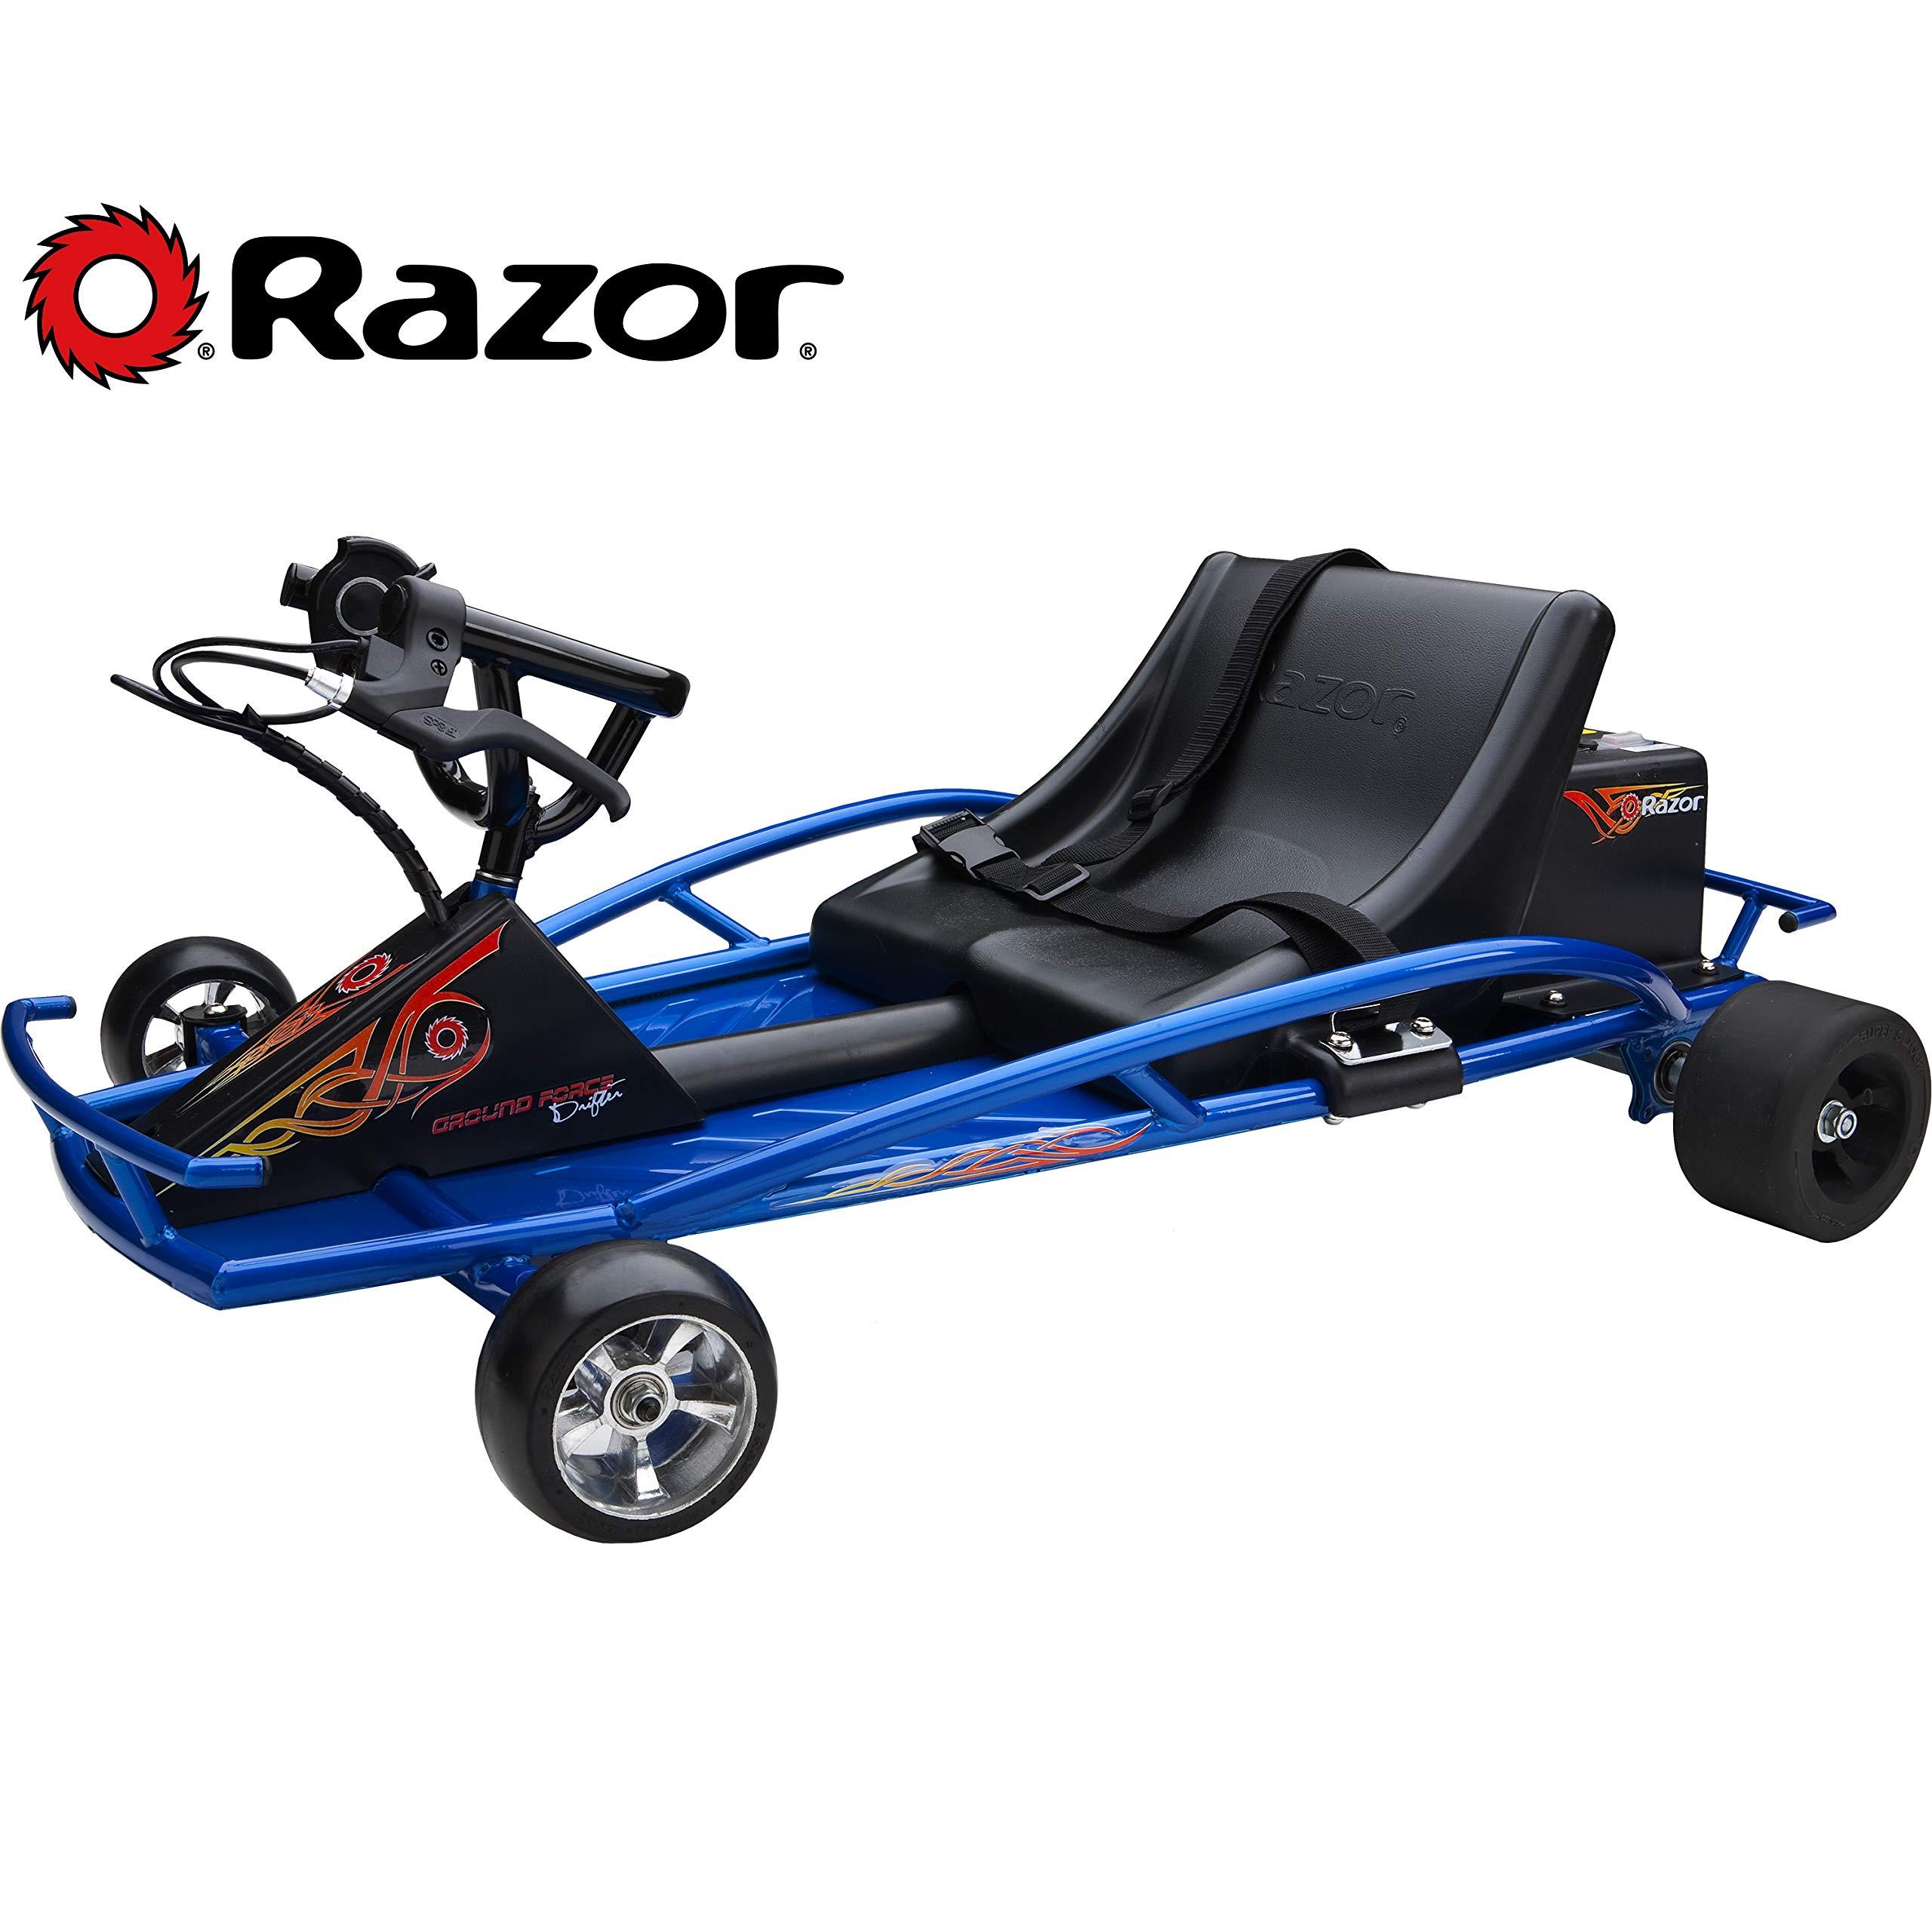 Razor Ground Force Drifter Kart by Razor